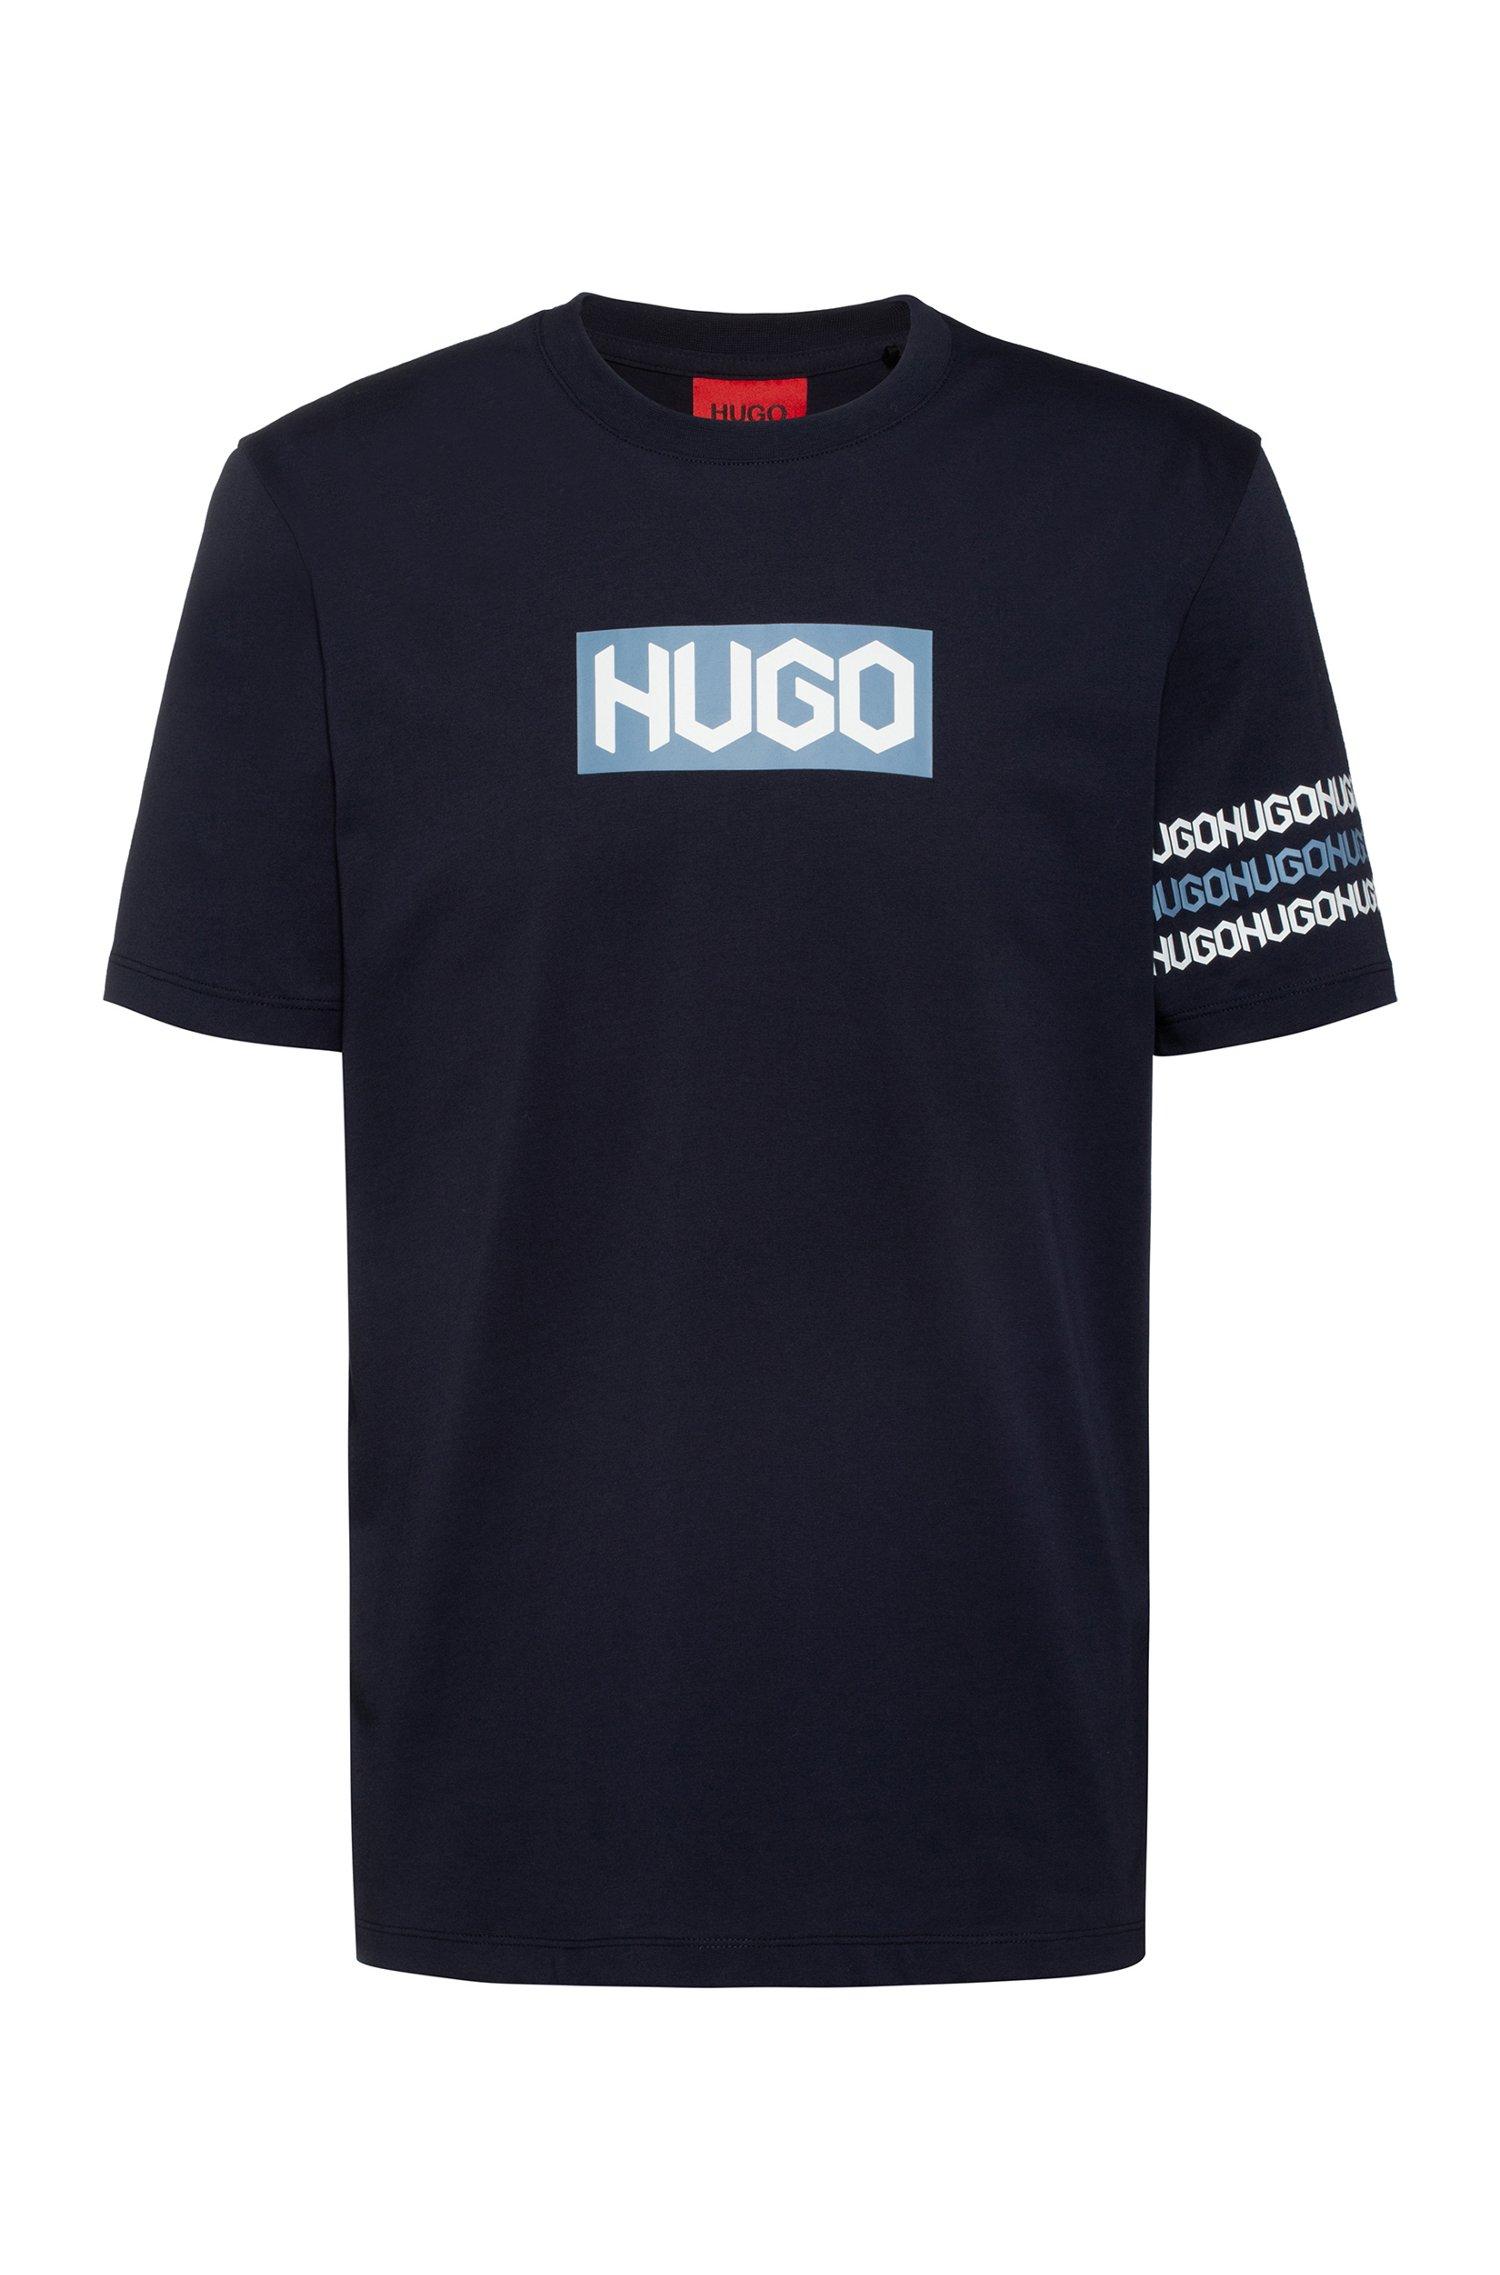 Cotton T-shirt with tyre-print logos, Dark Blue